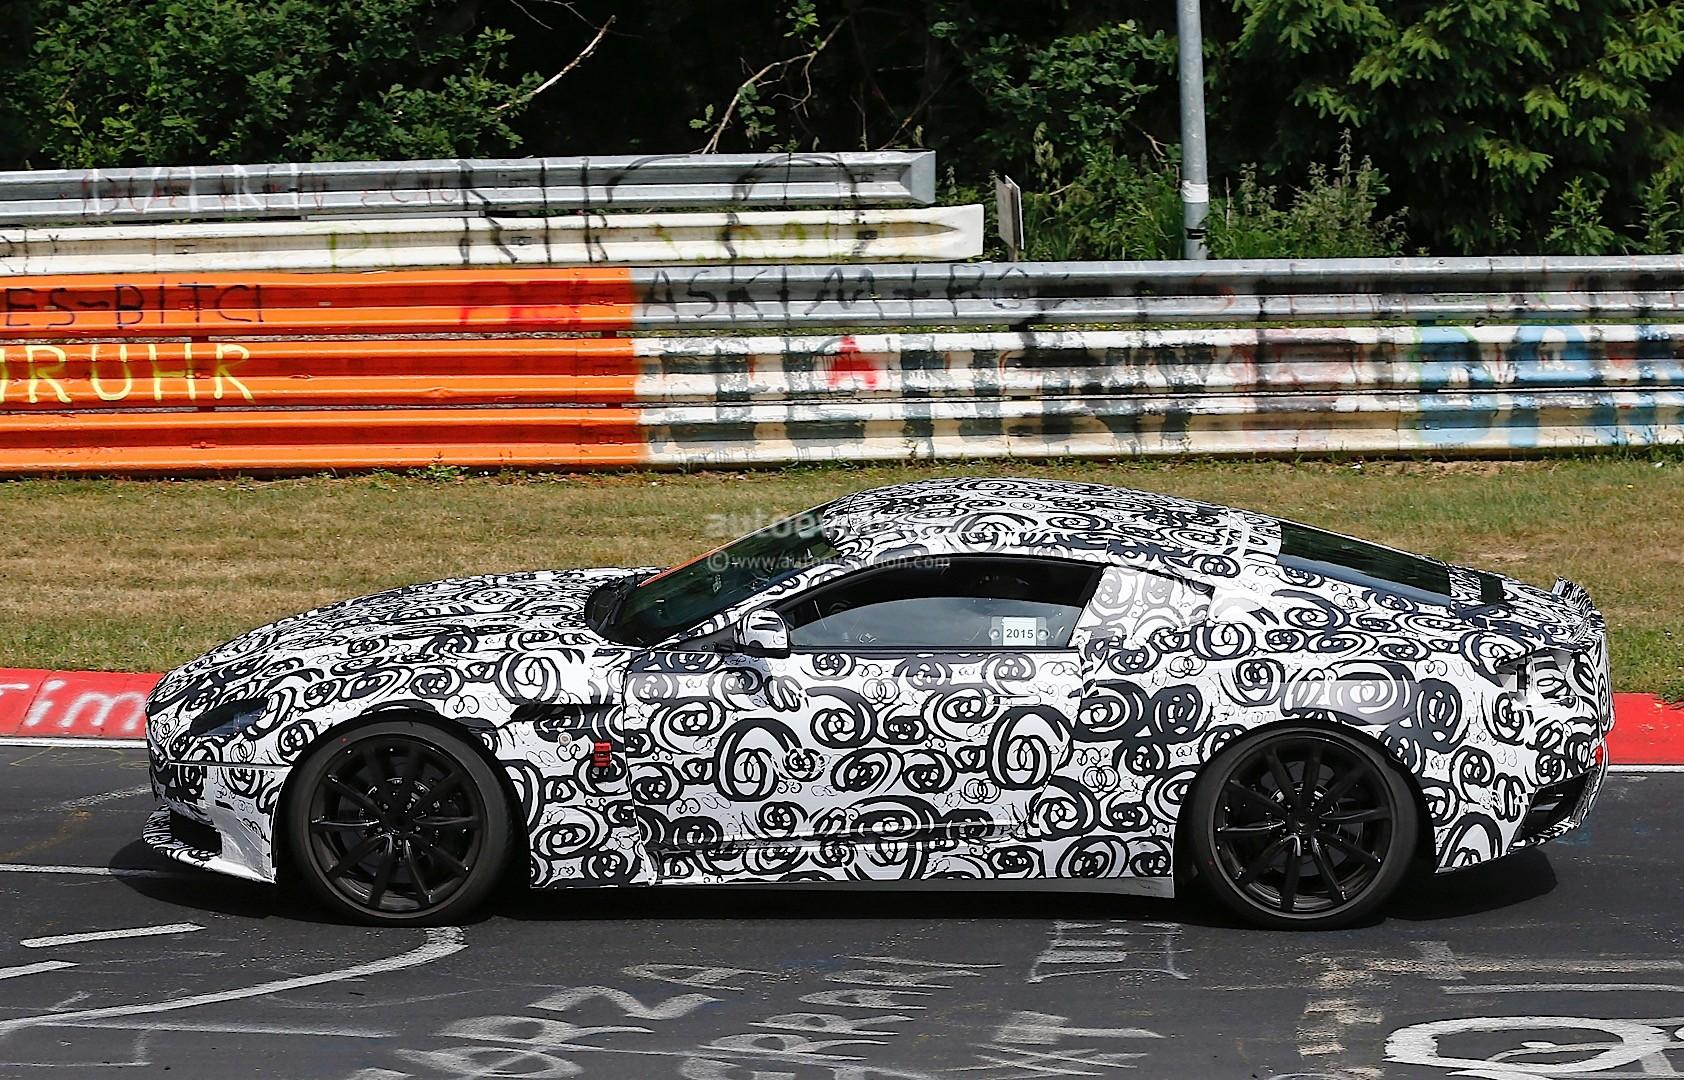 2016 - [Aston Martin] DB11 New-aston-martin-db11-prototype-looks-like-a-work-in-progress-photo-gallery_8